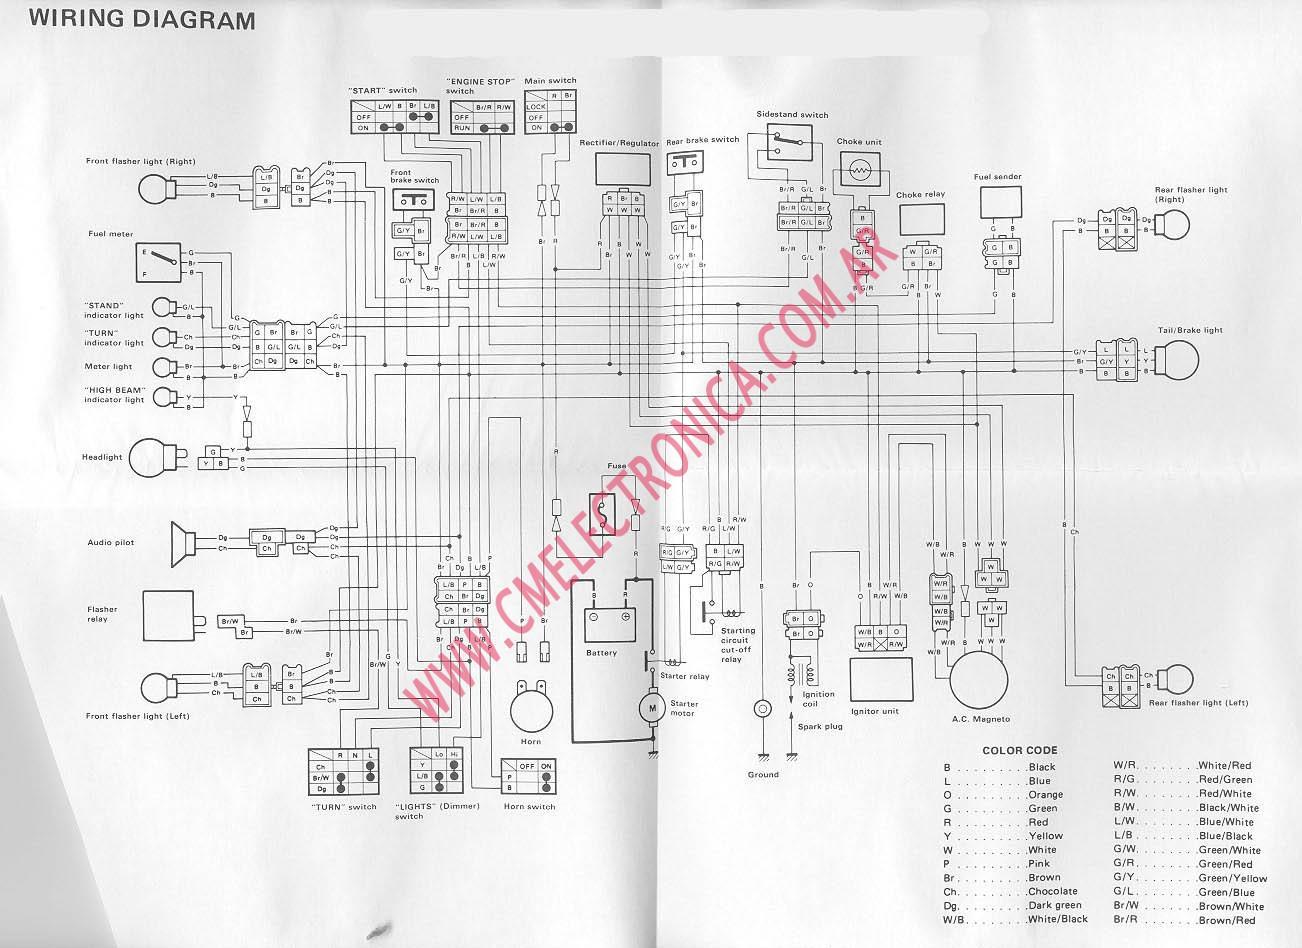 hight resolution of 06 yamaha blaster 200 wiring diagram yamaha blaster wiring light yamaha blaster wiring diagram yamaha blaster